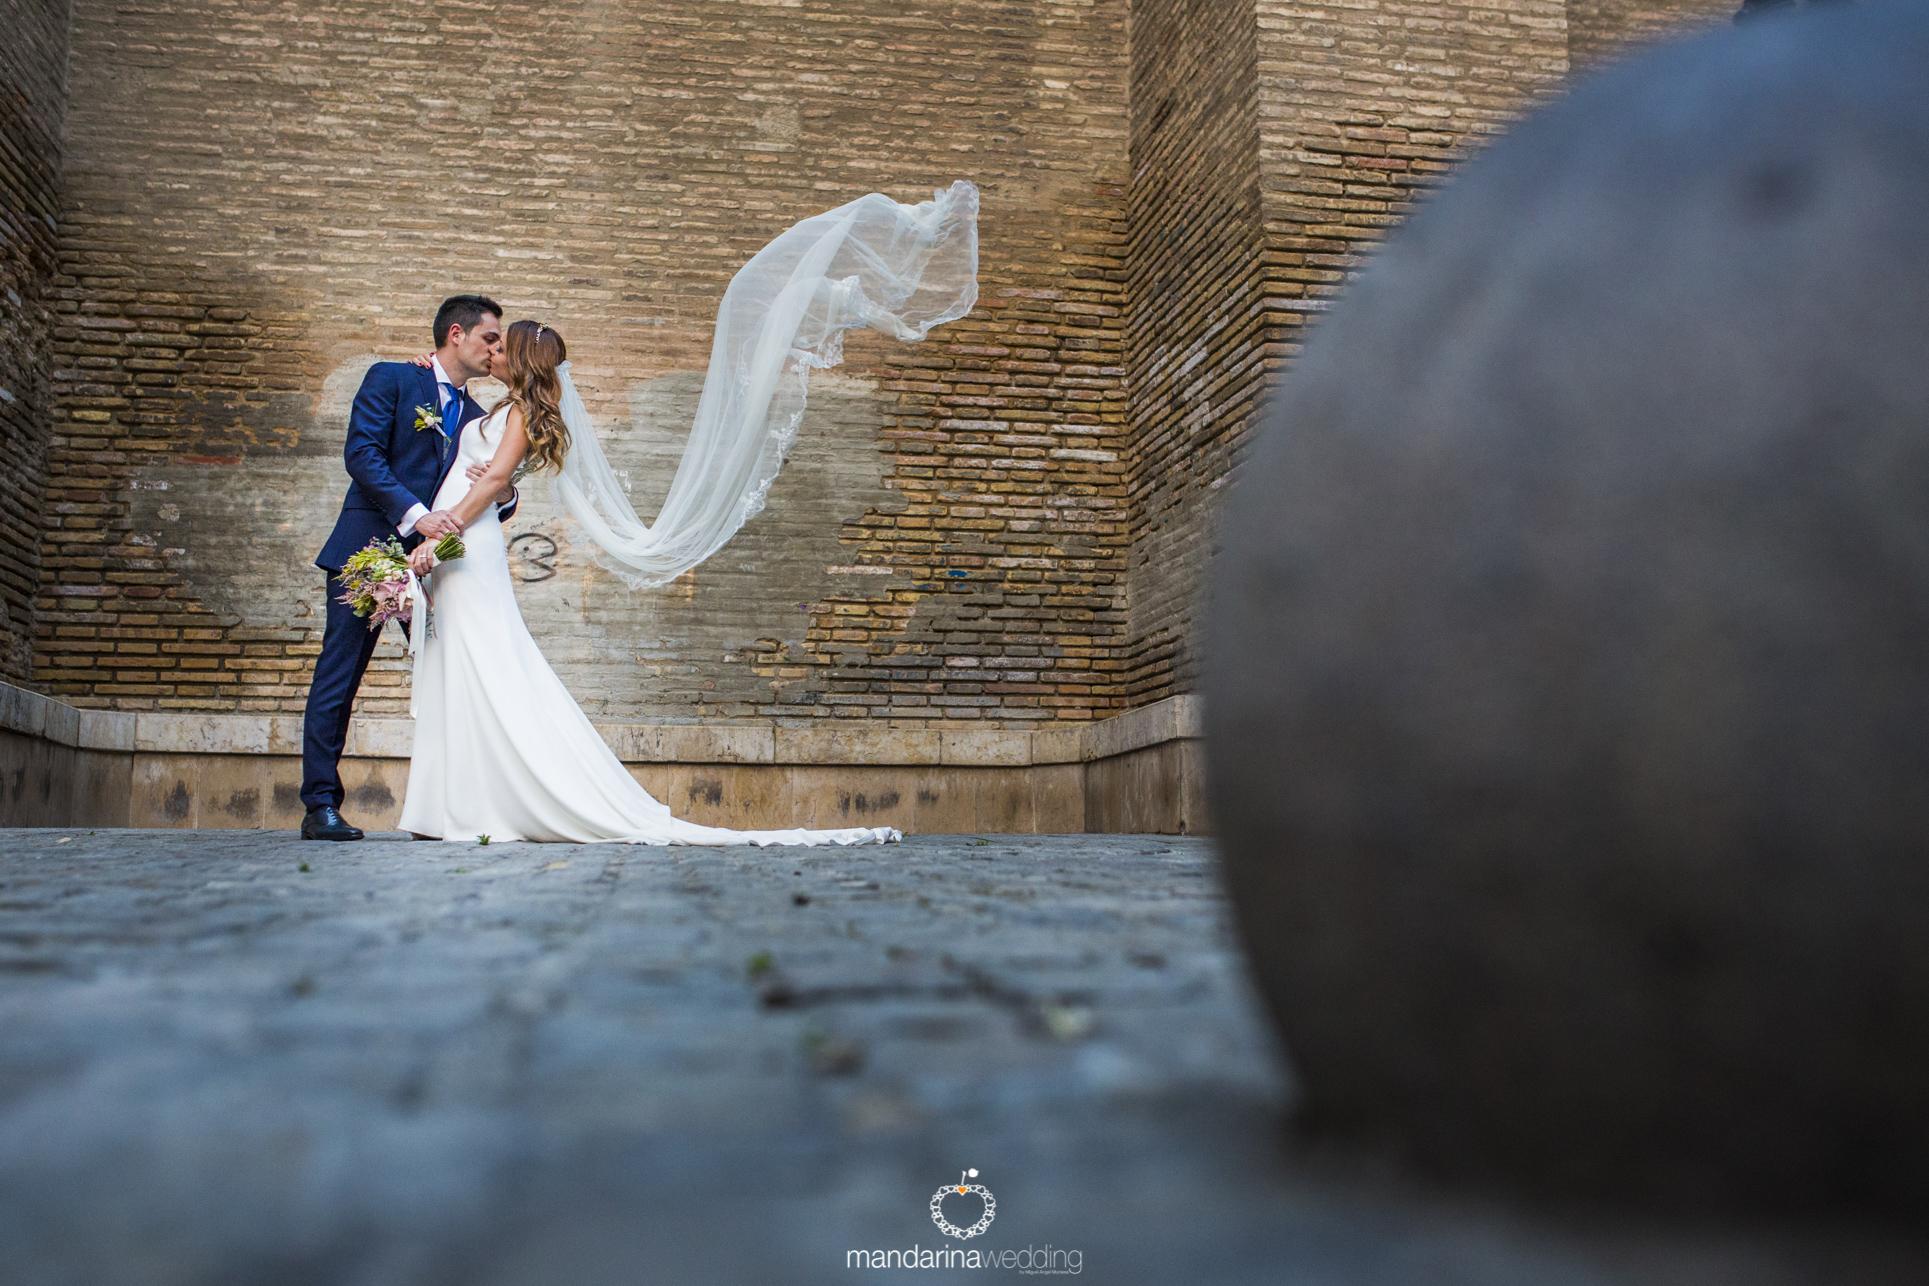 mandarina wedding, fotografo boda pais vasco, fotografo boda zaragoza, fotógrafo boda soria, fotografo boda Madrid, fotógrafo boda tarragona-37